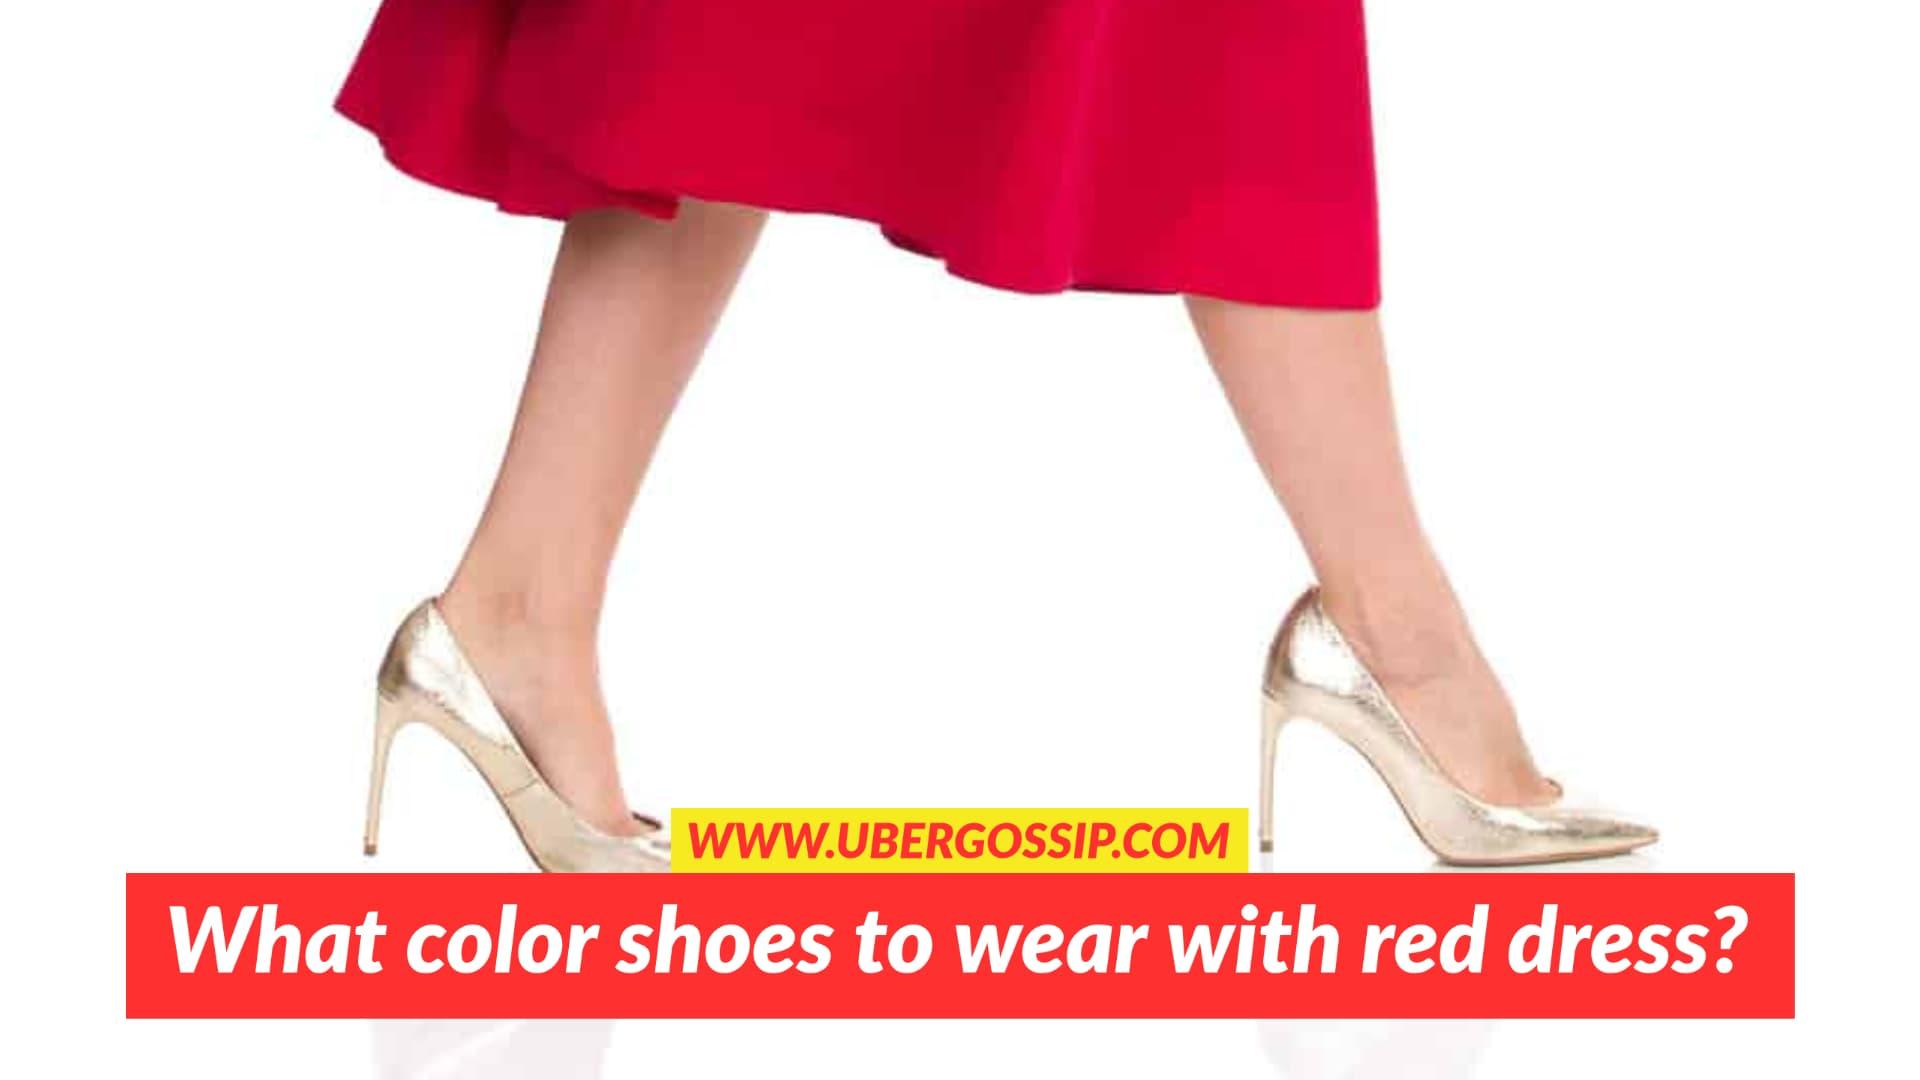 beige shoes, black shoes, blue shoes, bright red dress shoes, brown shoes, burgundy shoes, gold shoes, golden shoes, navy shoes, pastel pink shoes, purple shoes, red dress, red dress matching, red dress shoes, red outfit ideas, red outfits, red shoes, shoes for red dress, shoes to wear with red dress, silver shoes, what color are the shoes, what color goes with red, what color is the shoe, what color is this shoe, what color match red, what color shoes, What color shoes to wear with red dress, what colors go with red clothes, what goes well with red, what goes with red, white shoes, womens red dress shoes